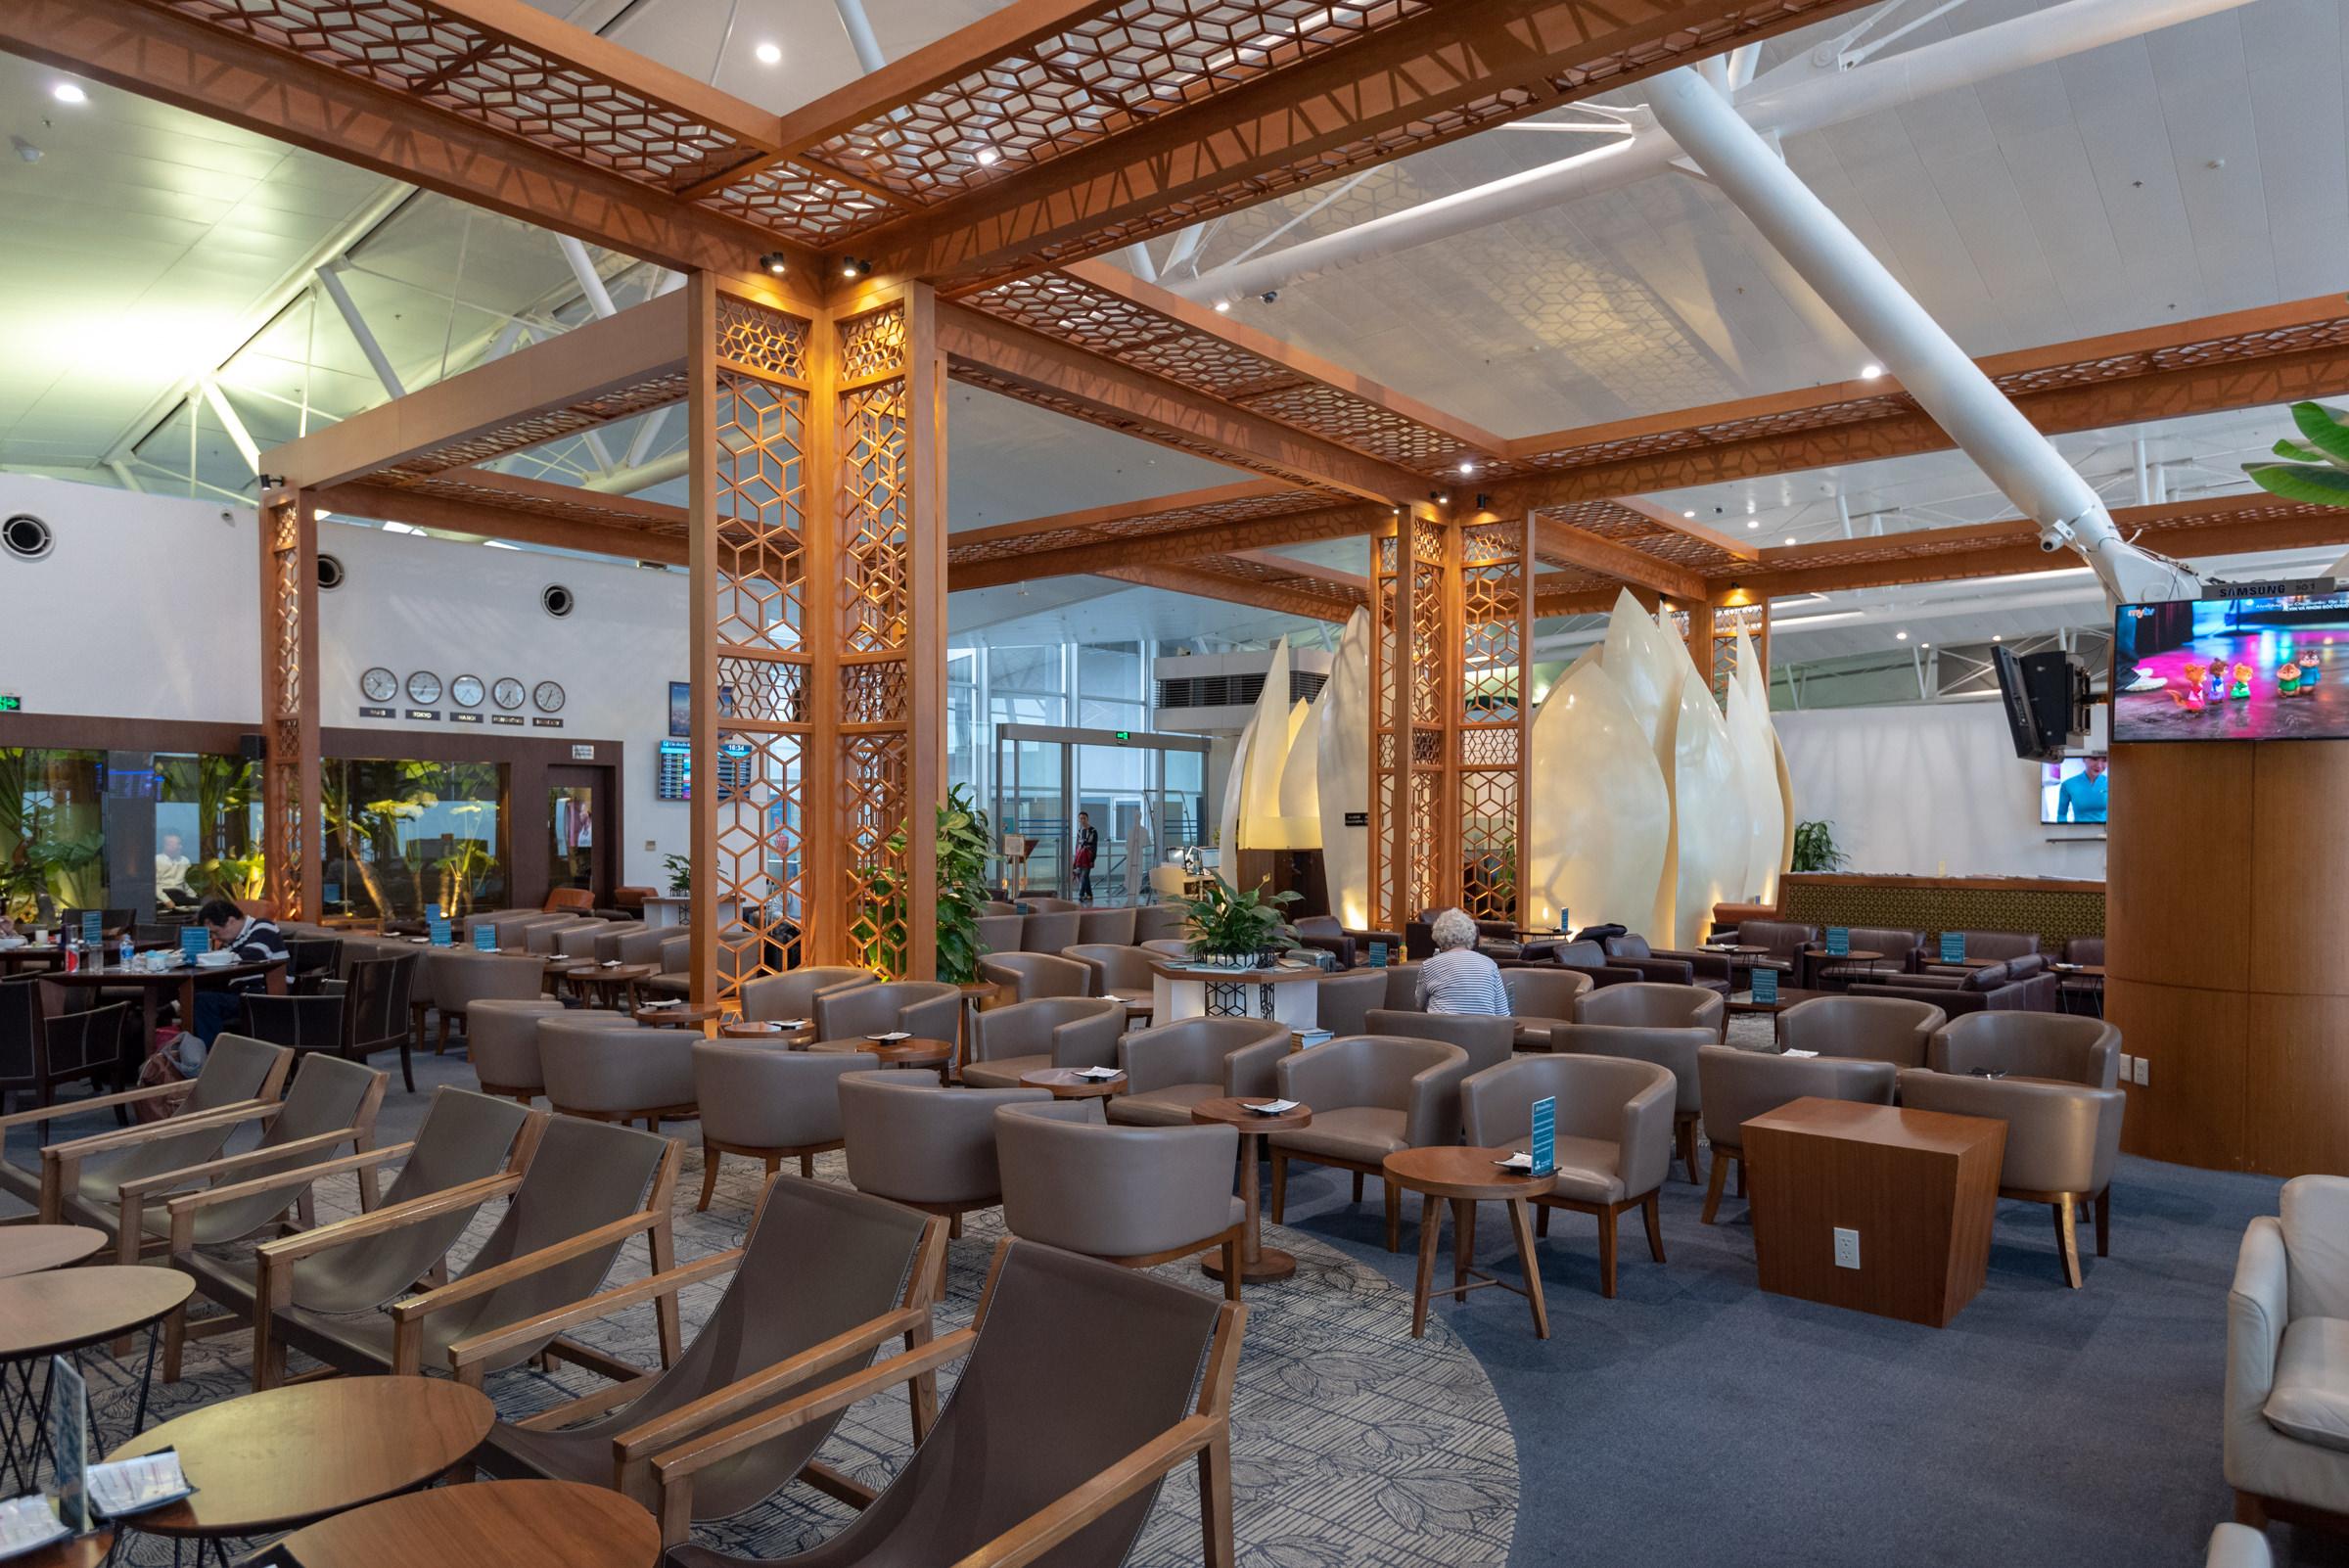 Interiors  Vietnam Airlines Lotus Lounge - Noi Bai International Airport